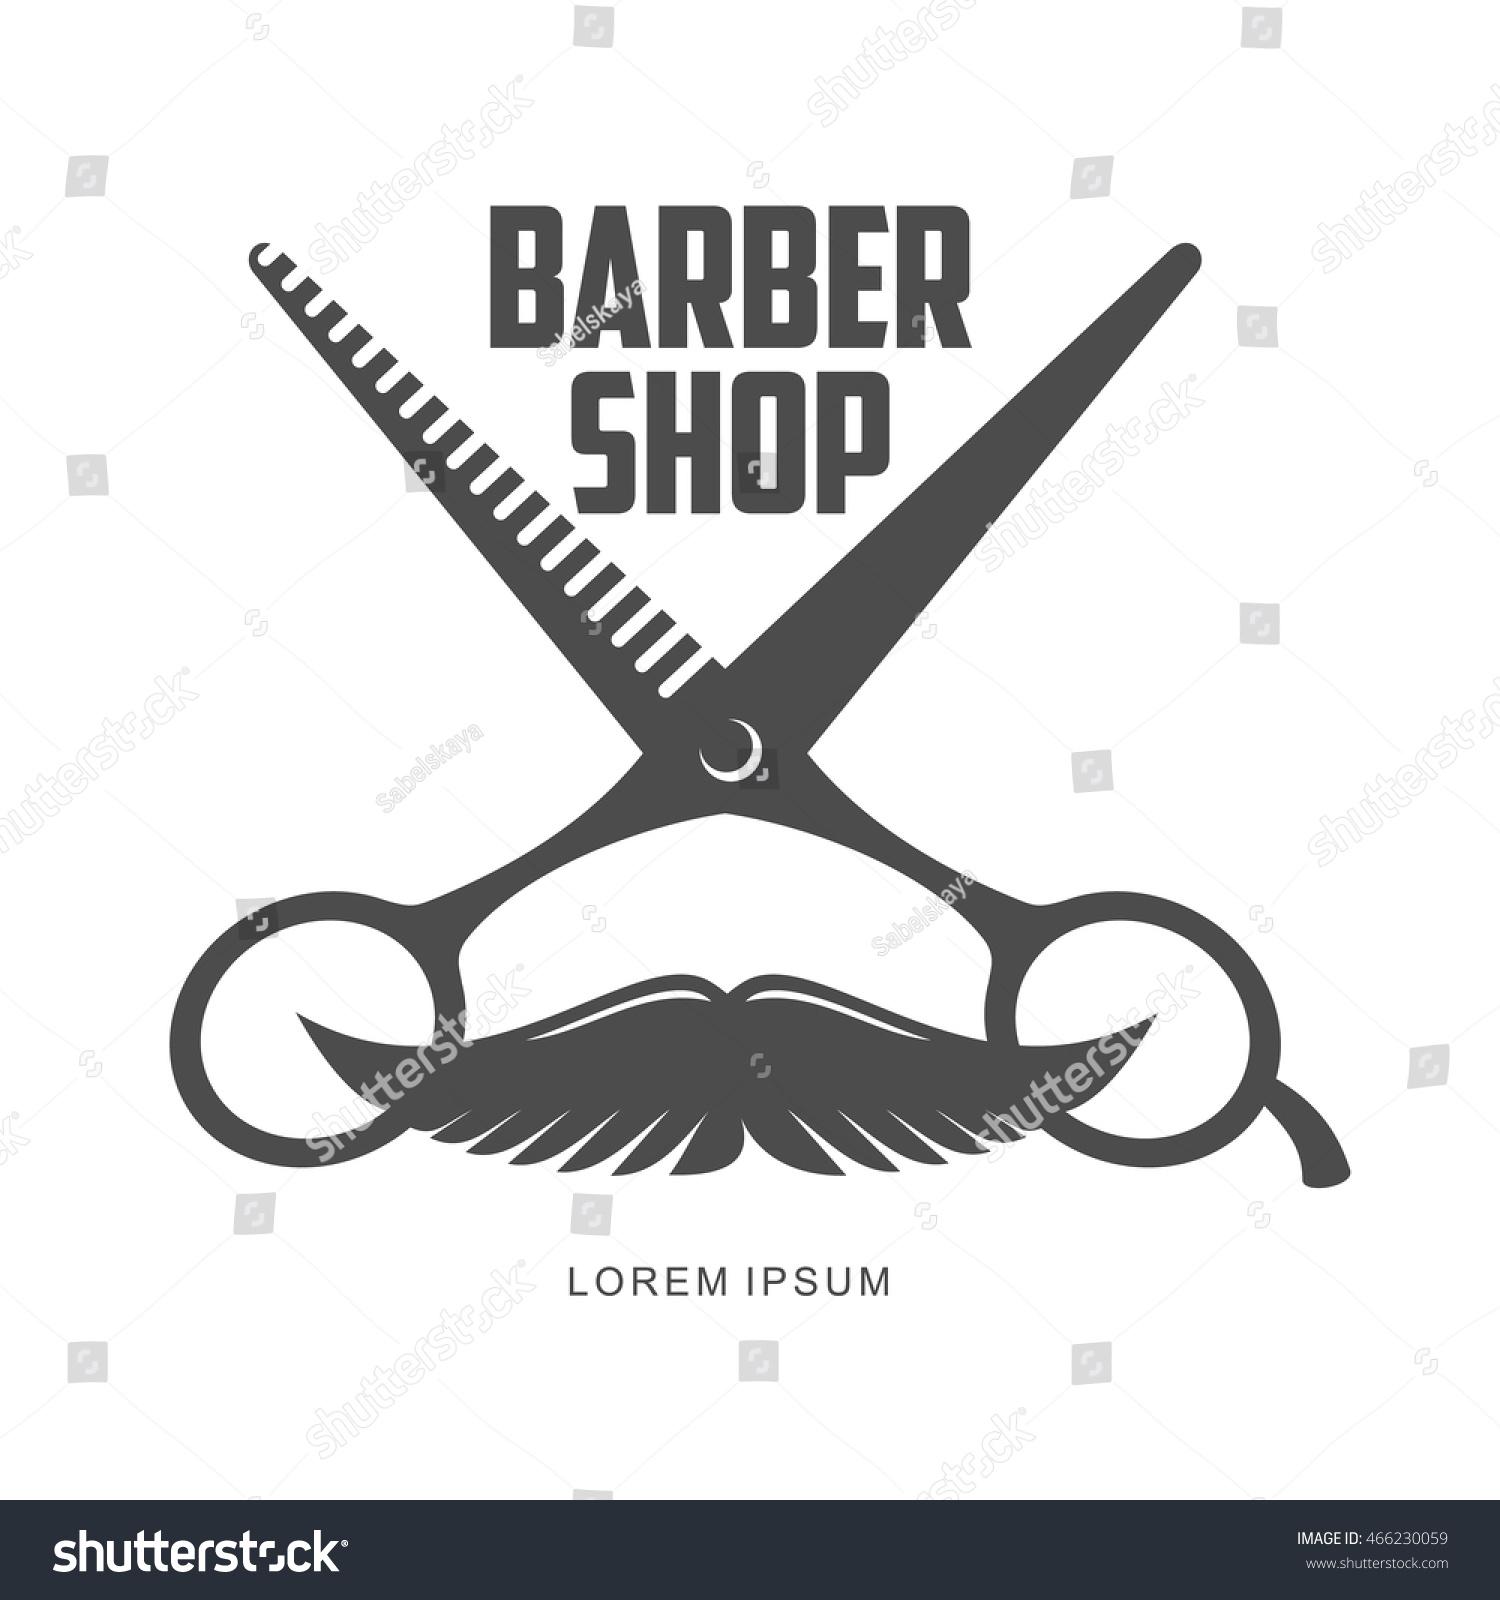 Clip art vector of vintage barber shop logo graphics and icon vector - Vintage Barber Shop Logo Label Badge And Design Element Vector Illustration Isolated On